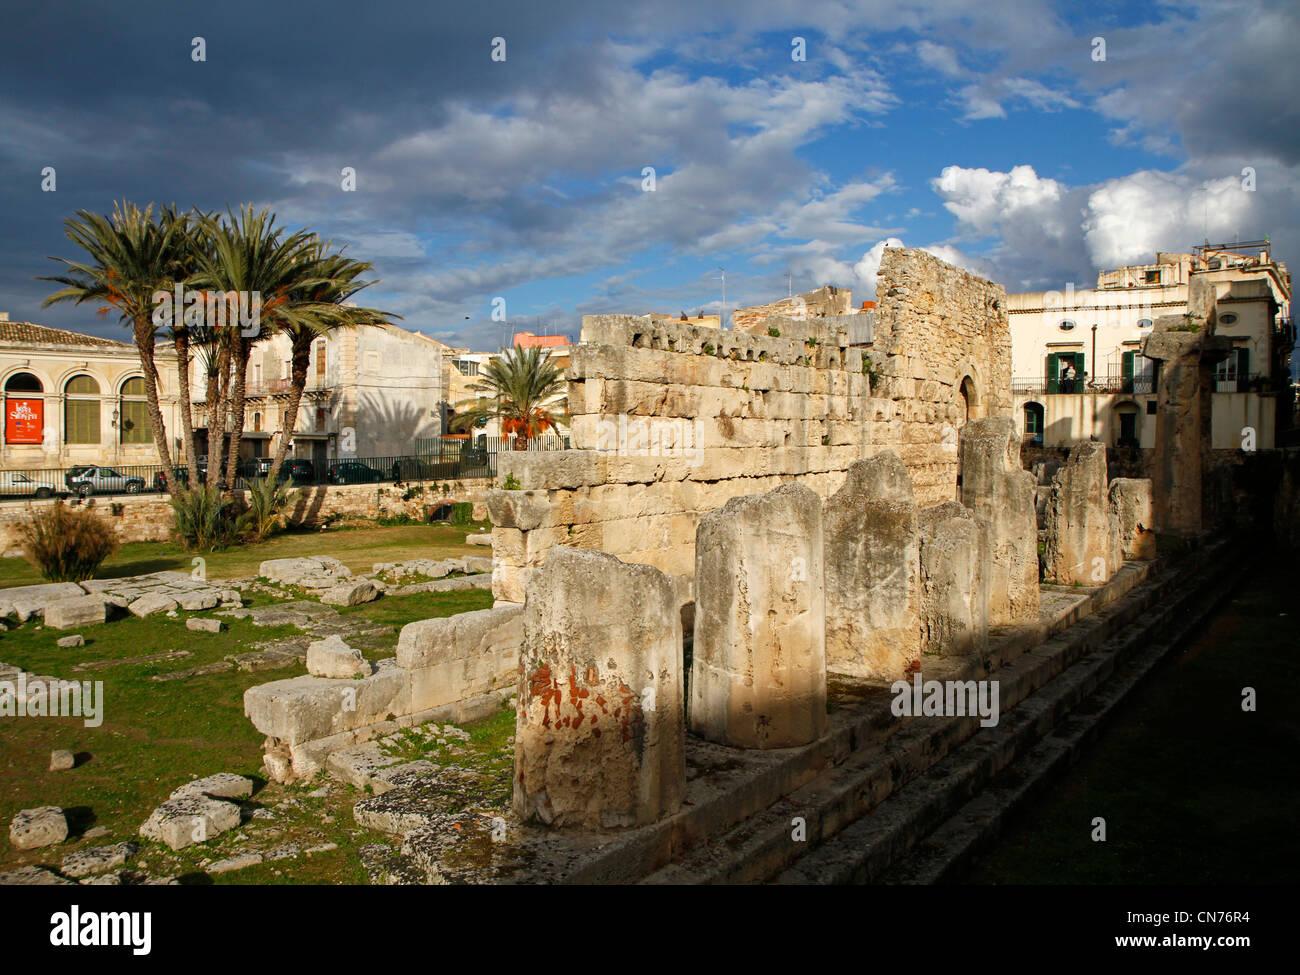 Temple of Apollo, Siracusa, Sicily, Italy - Stock Image